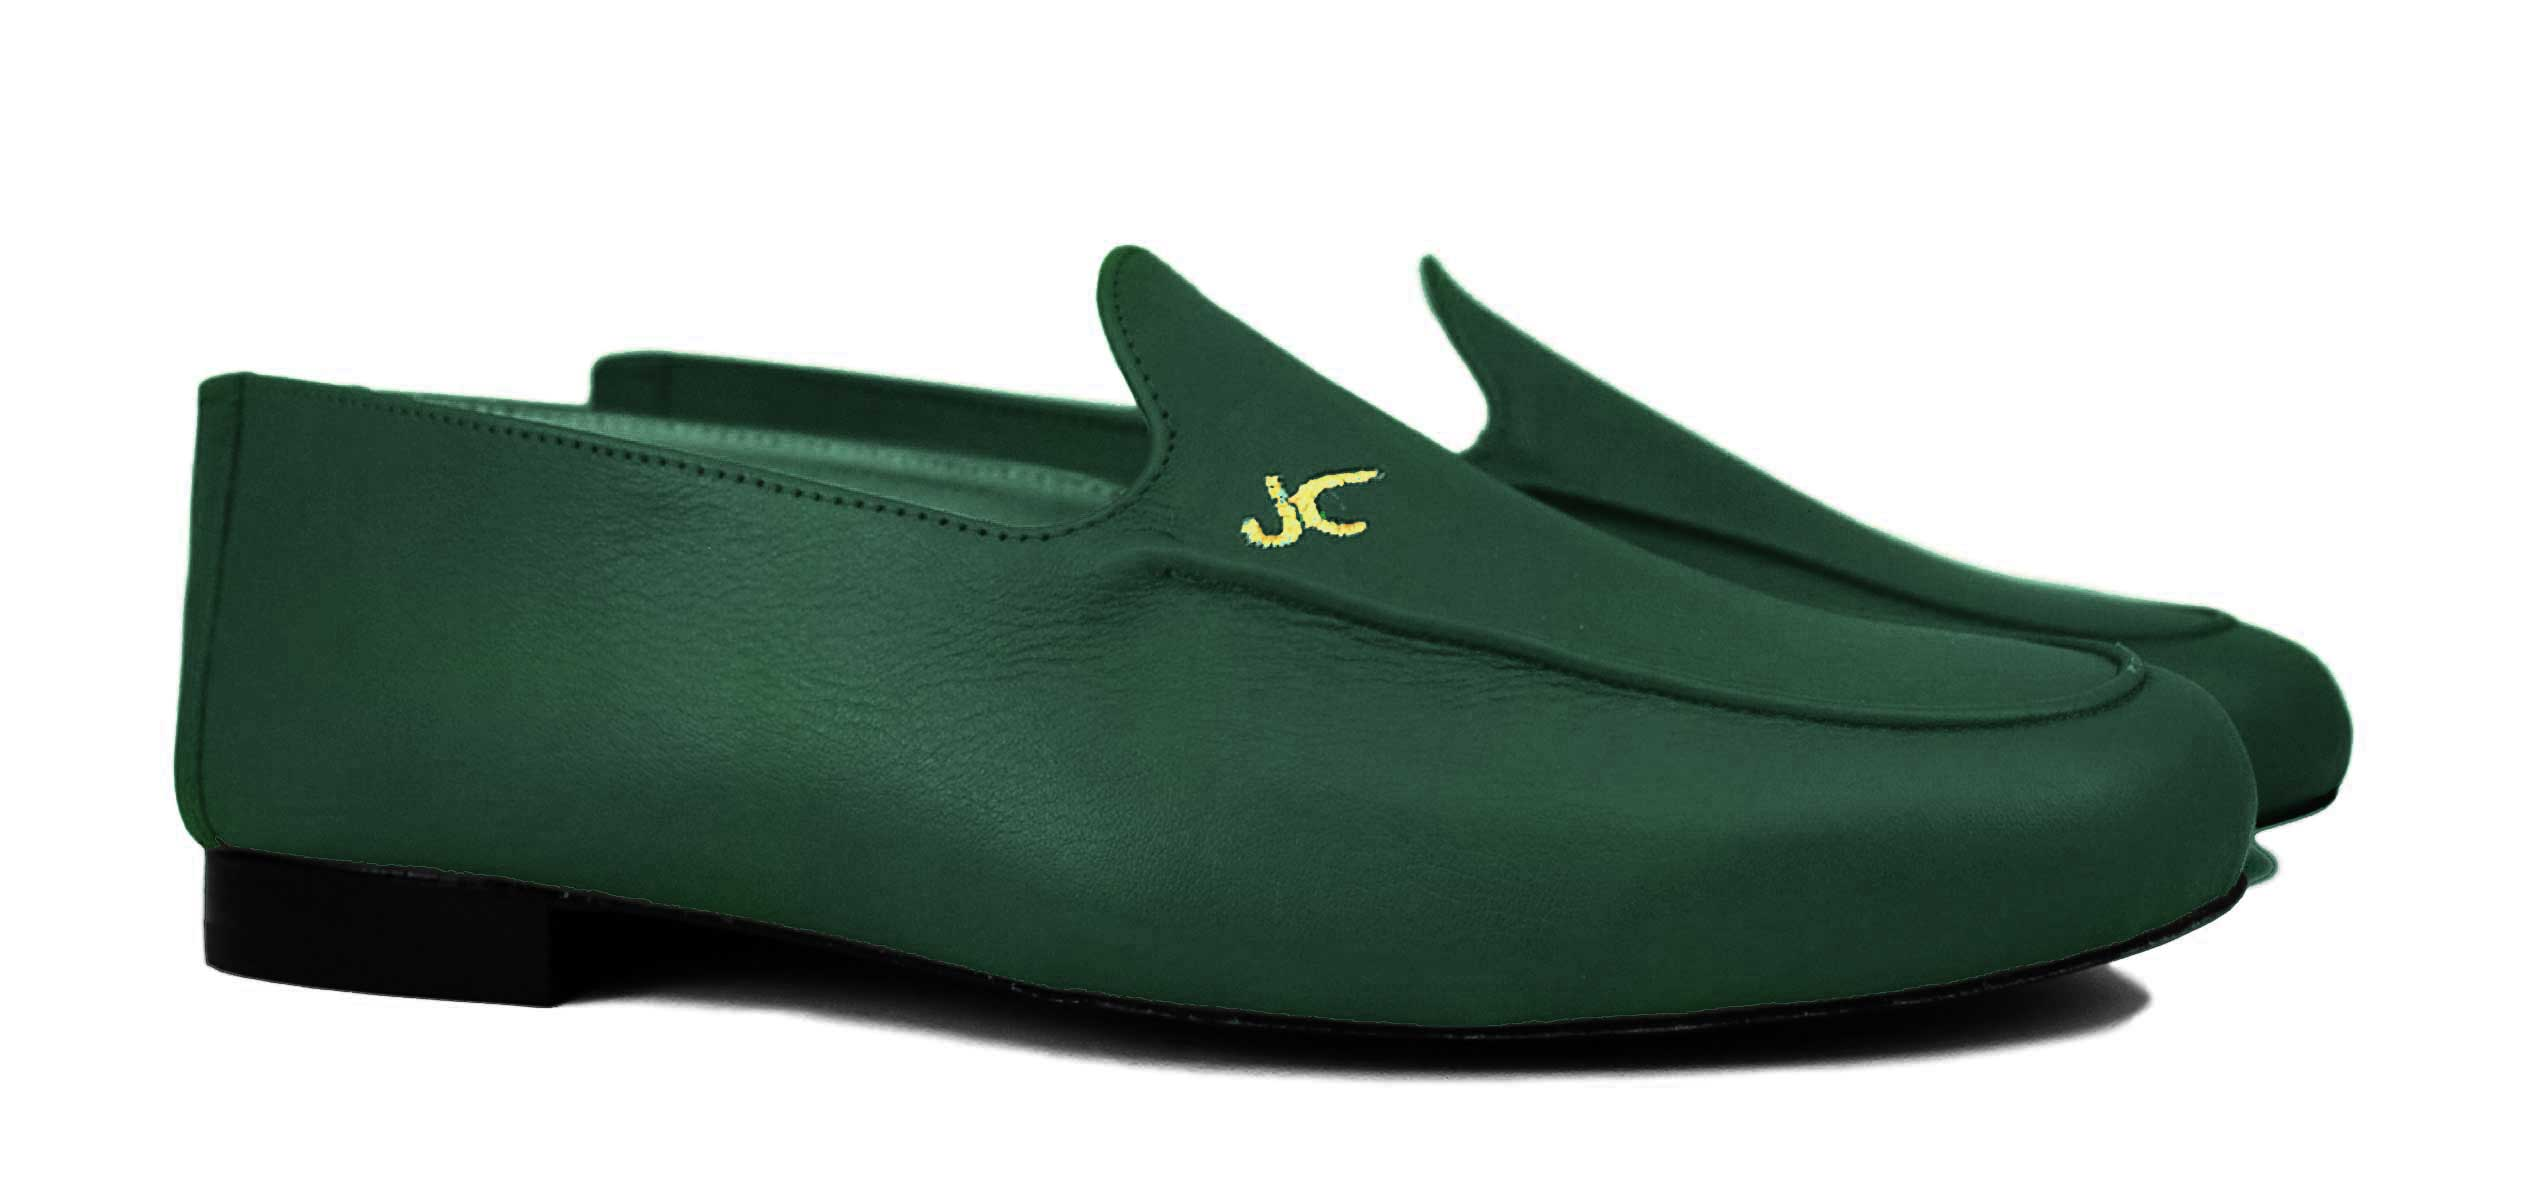 Foto 5 de Zapatos Julio Iglesias 528 JC Forest Piel Napa